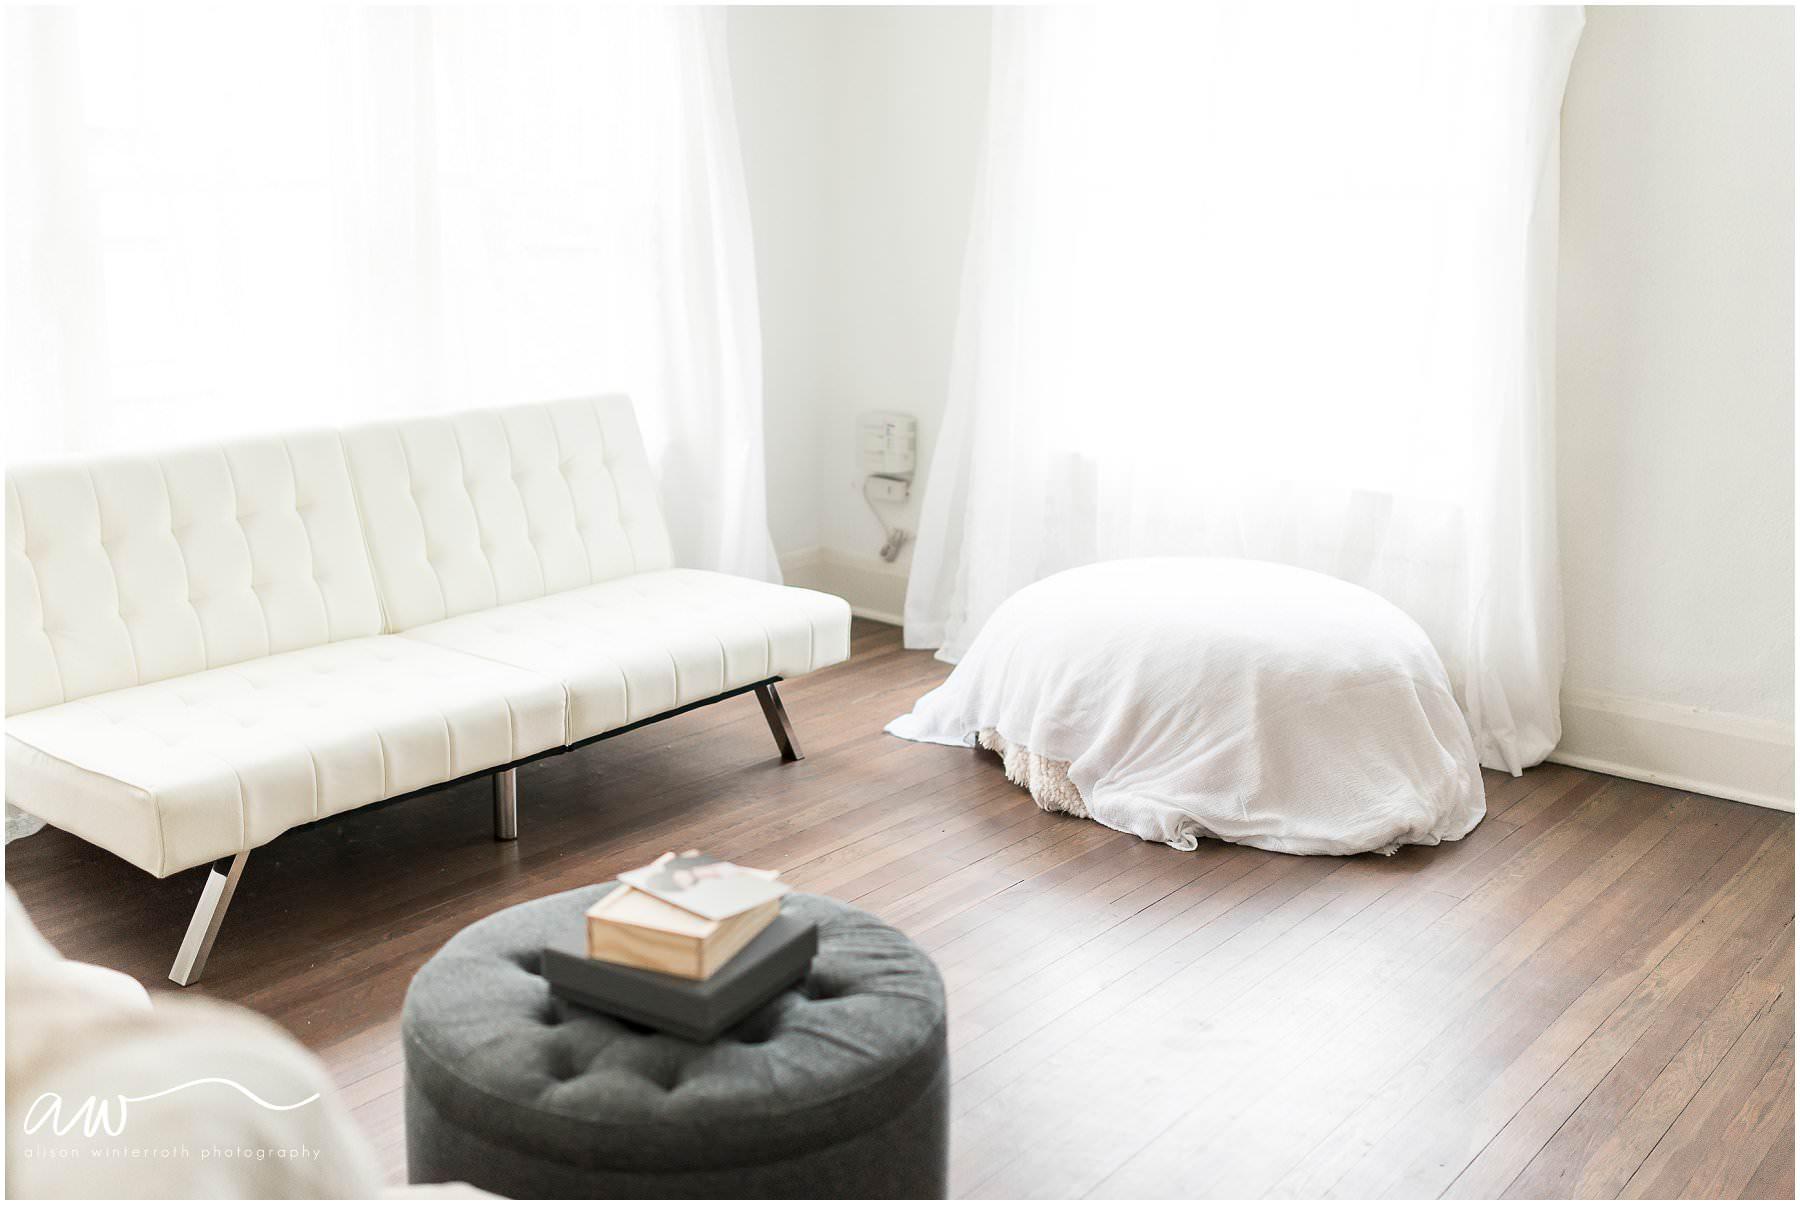 wide photograph of Alison Winterroth Photography's studio